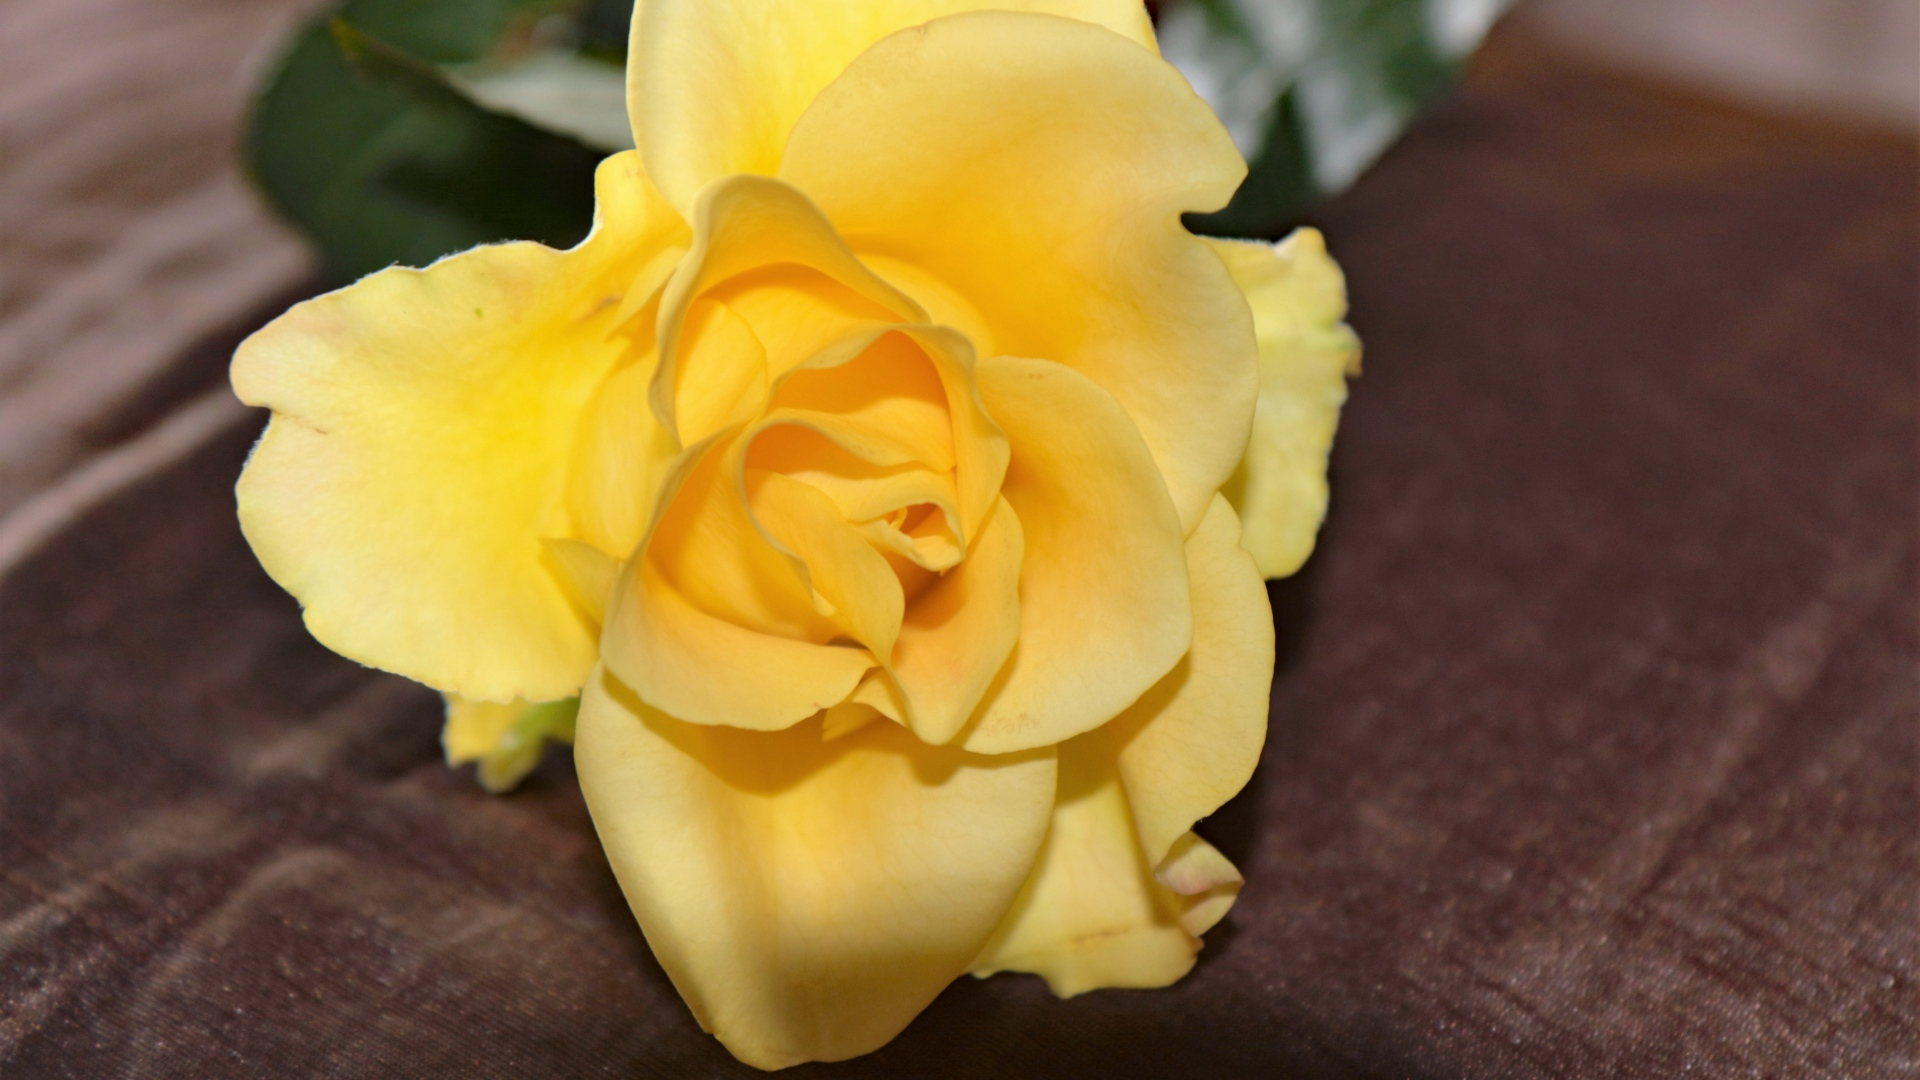 hd hintergrundbilder rose blütenblätter gelb knospe 1920x1080